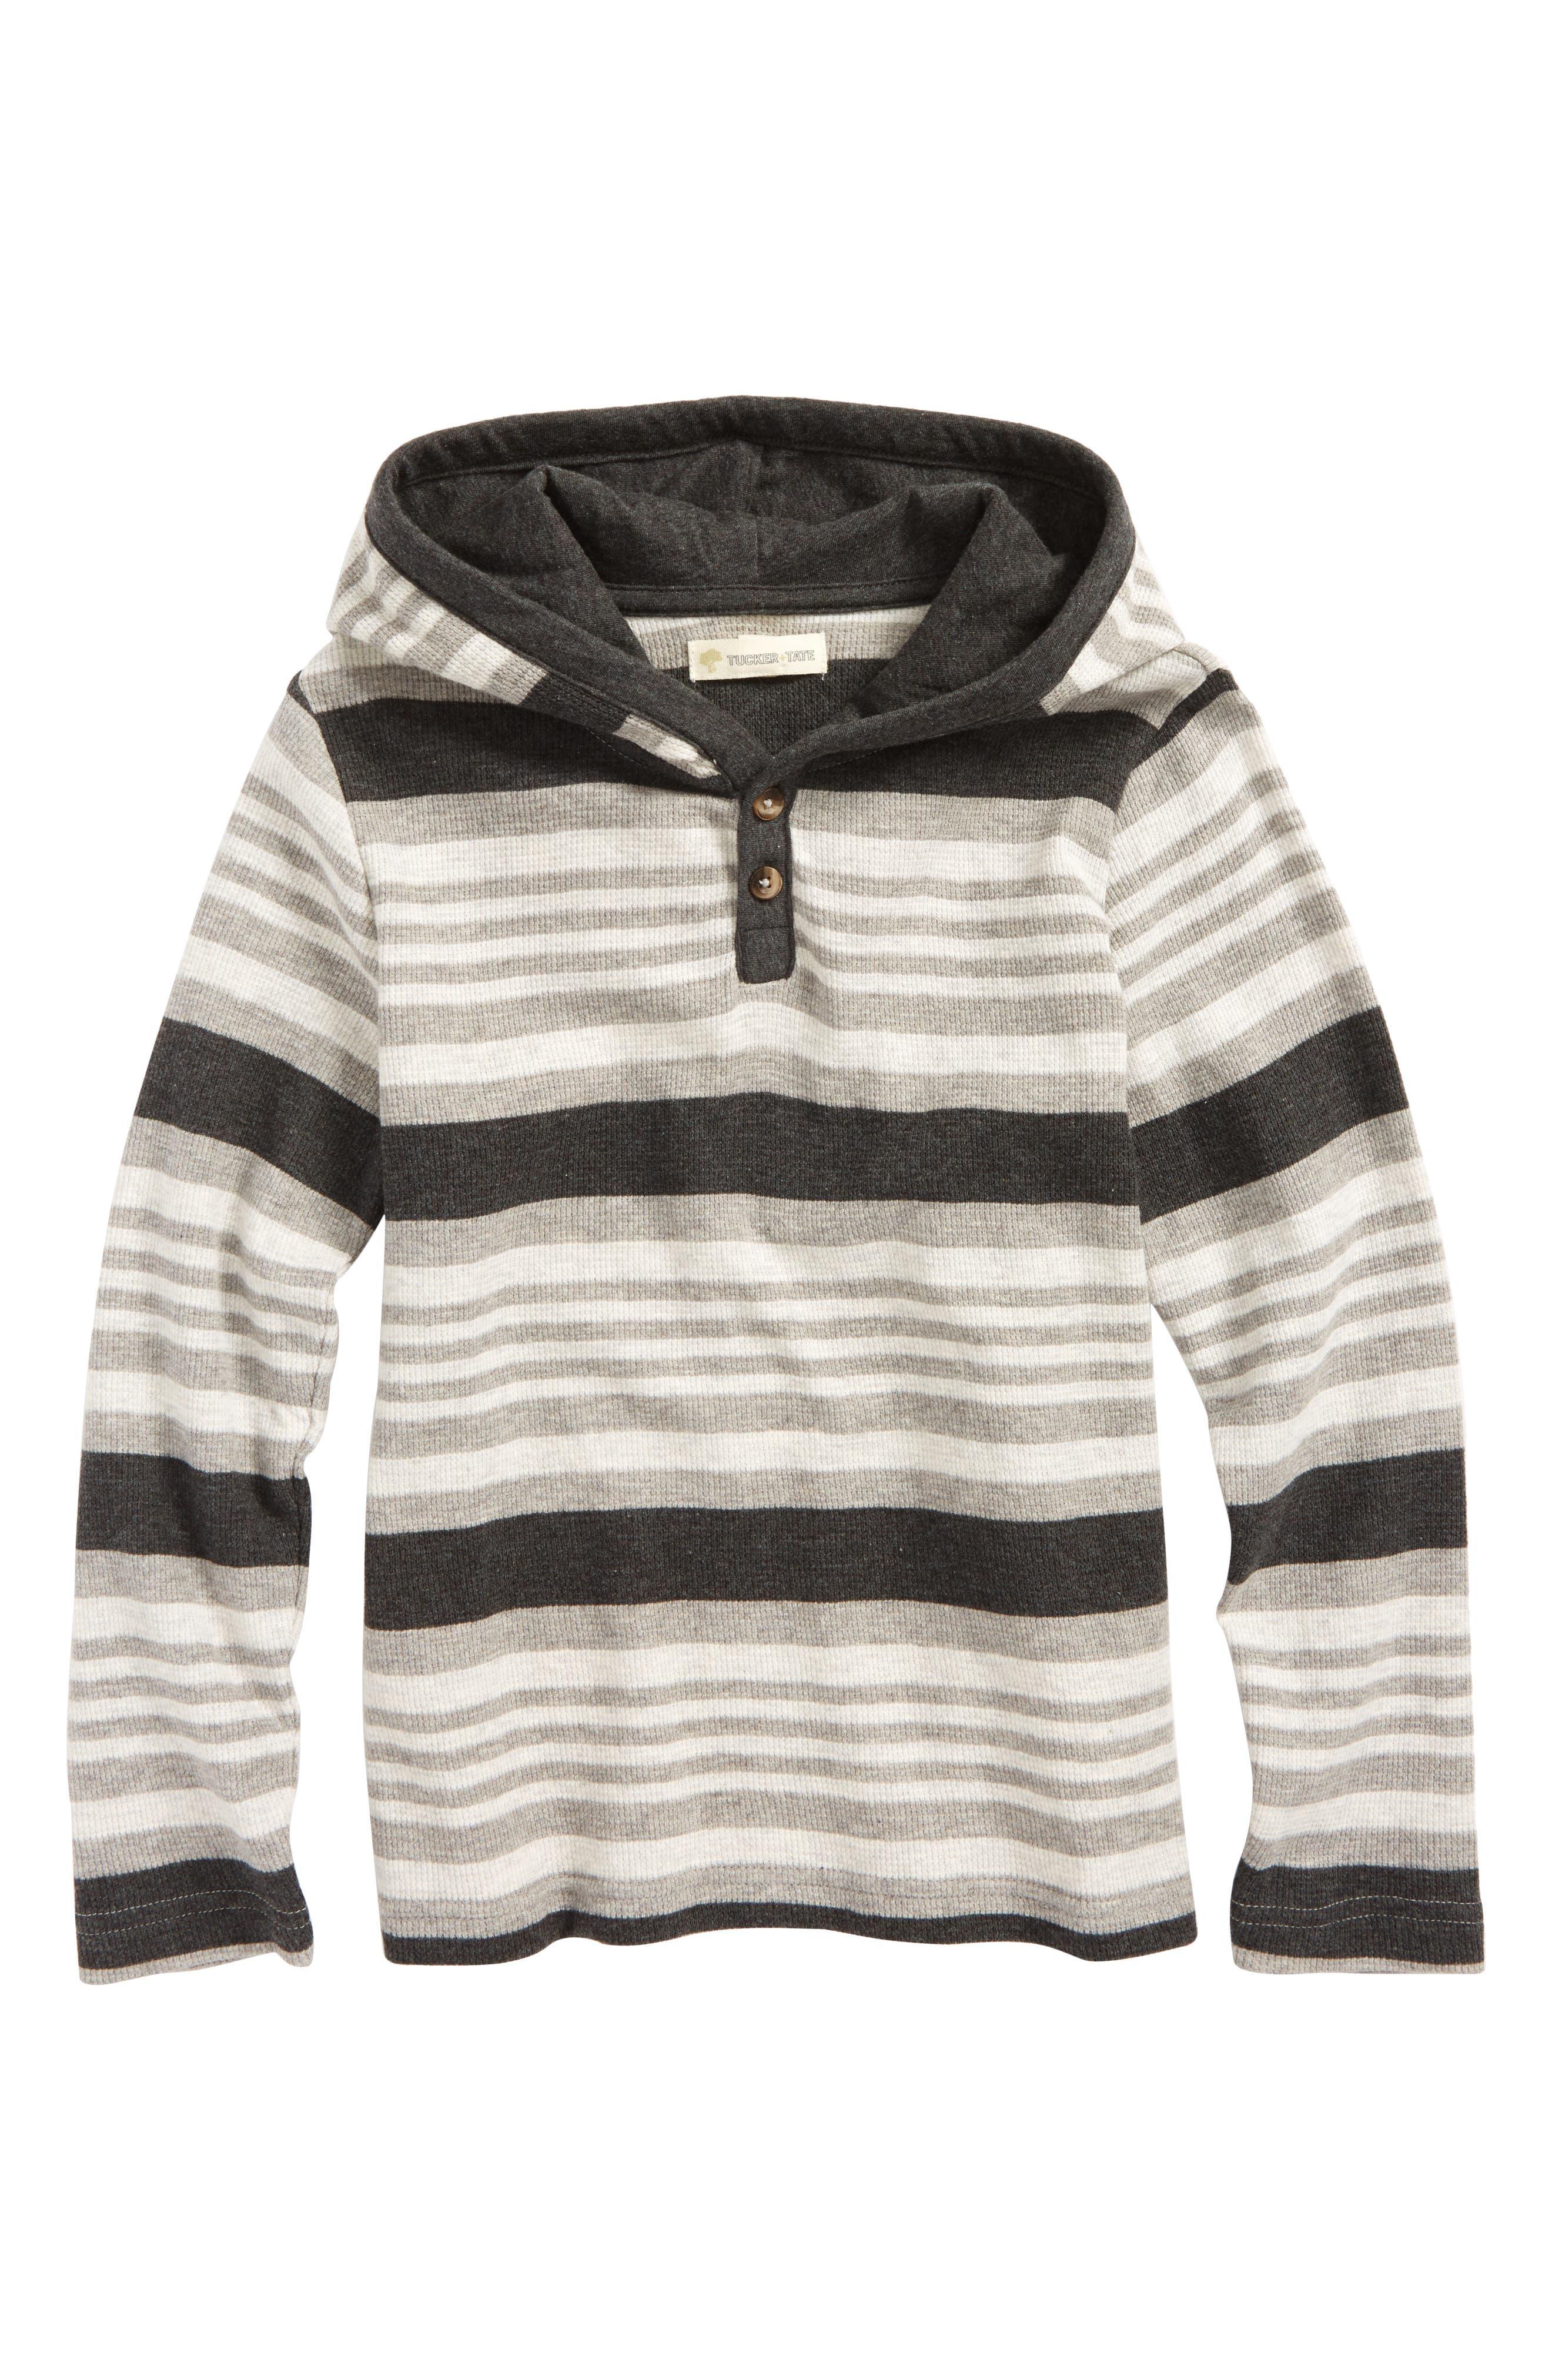 Tucker + Tate Hooded Thermal T-Shirt (Toddler Boys & Little Boys)